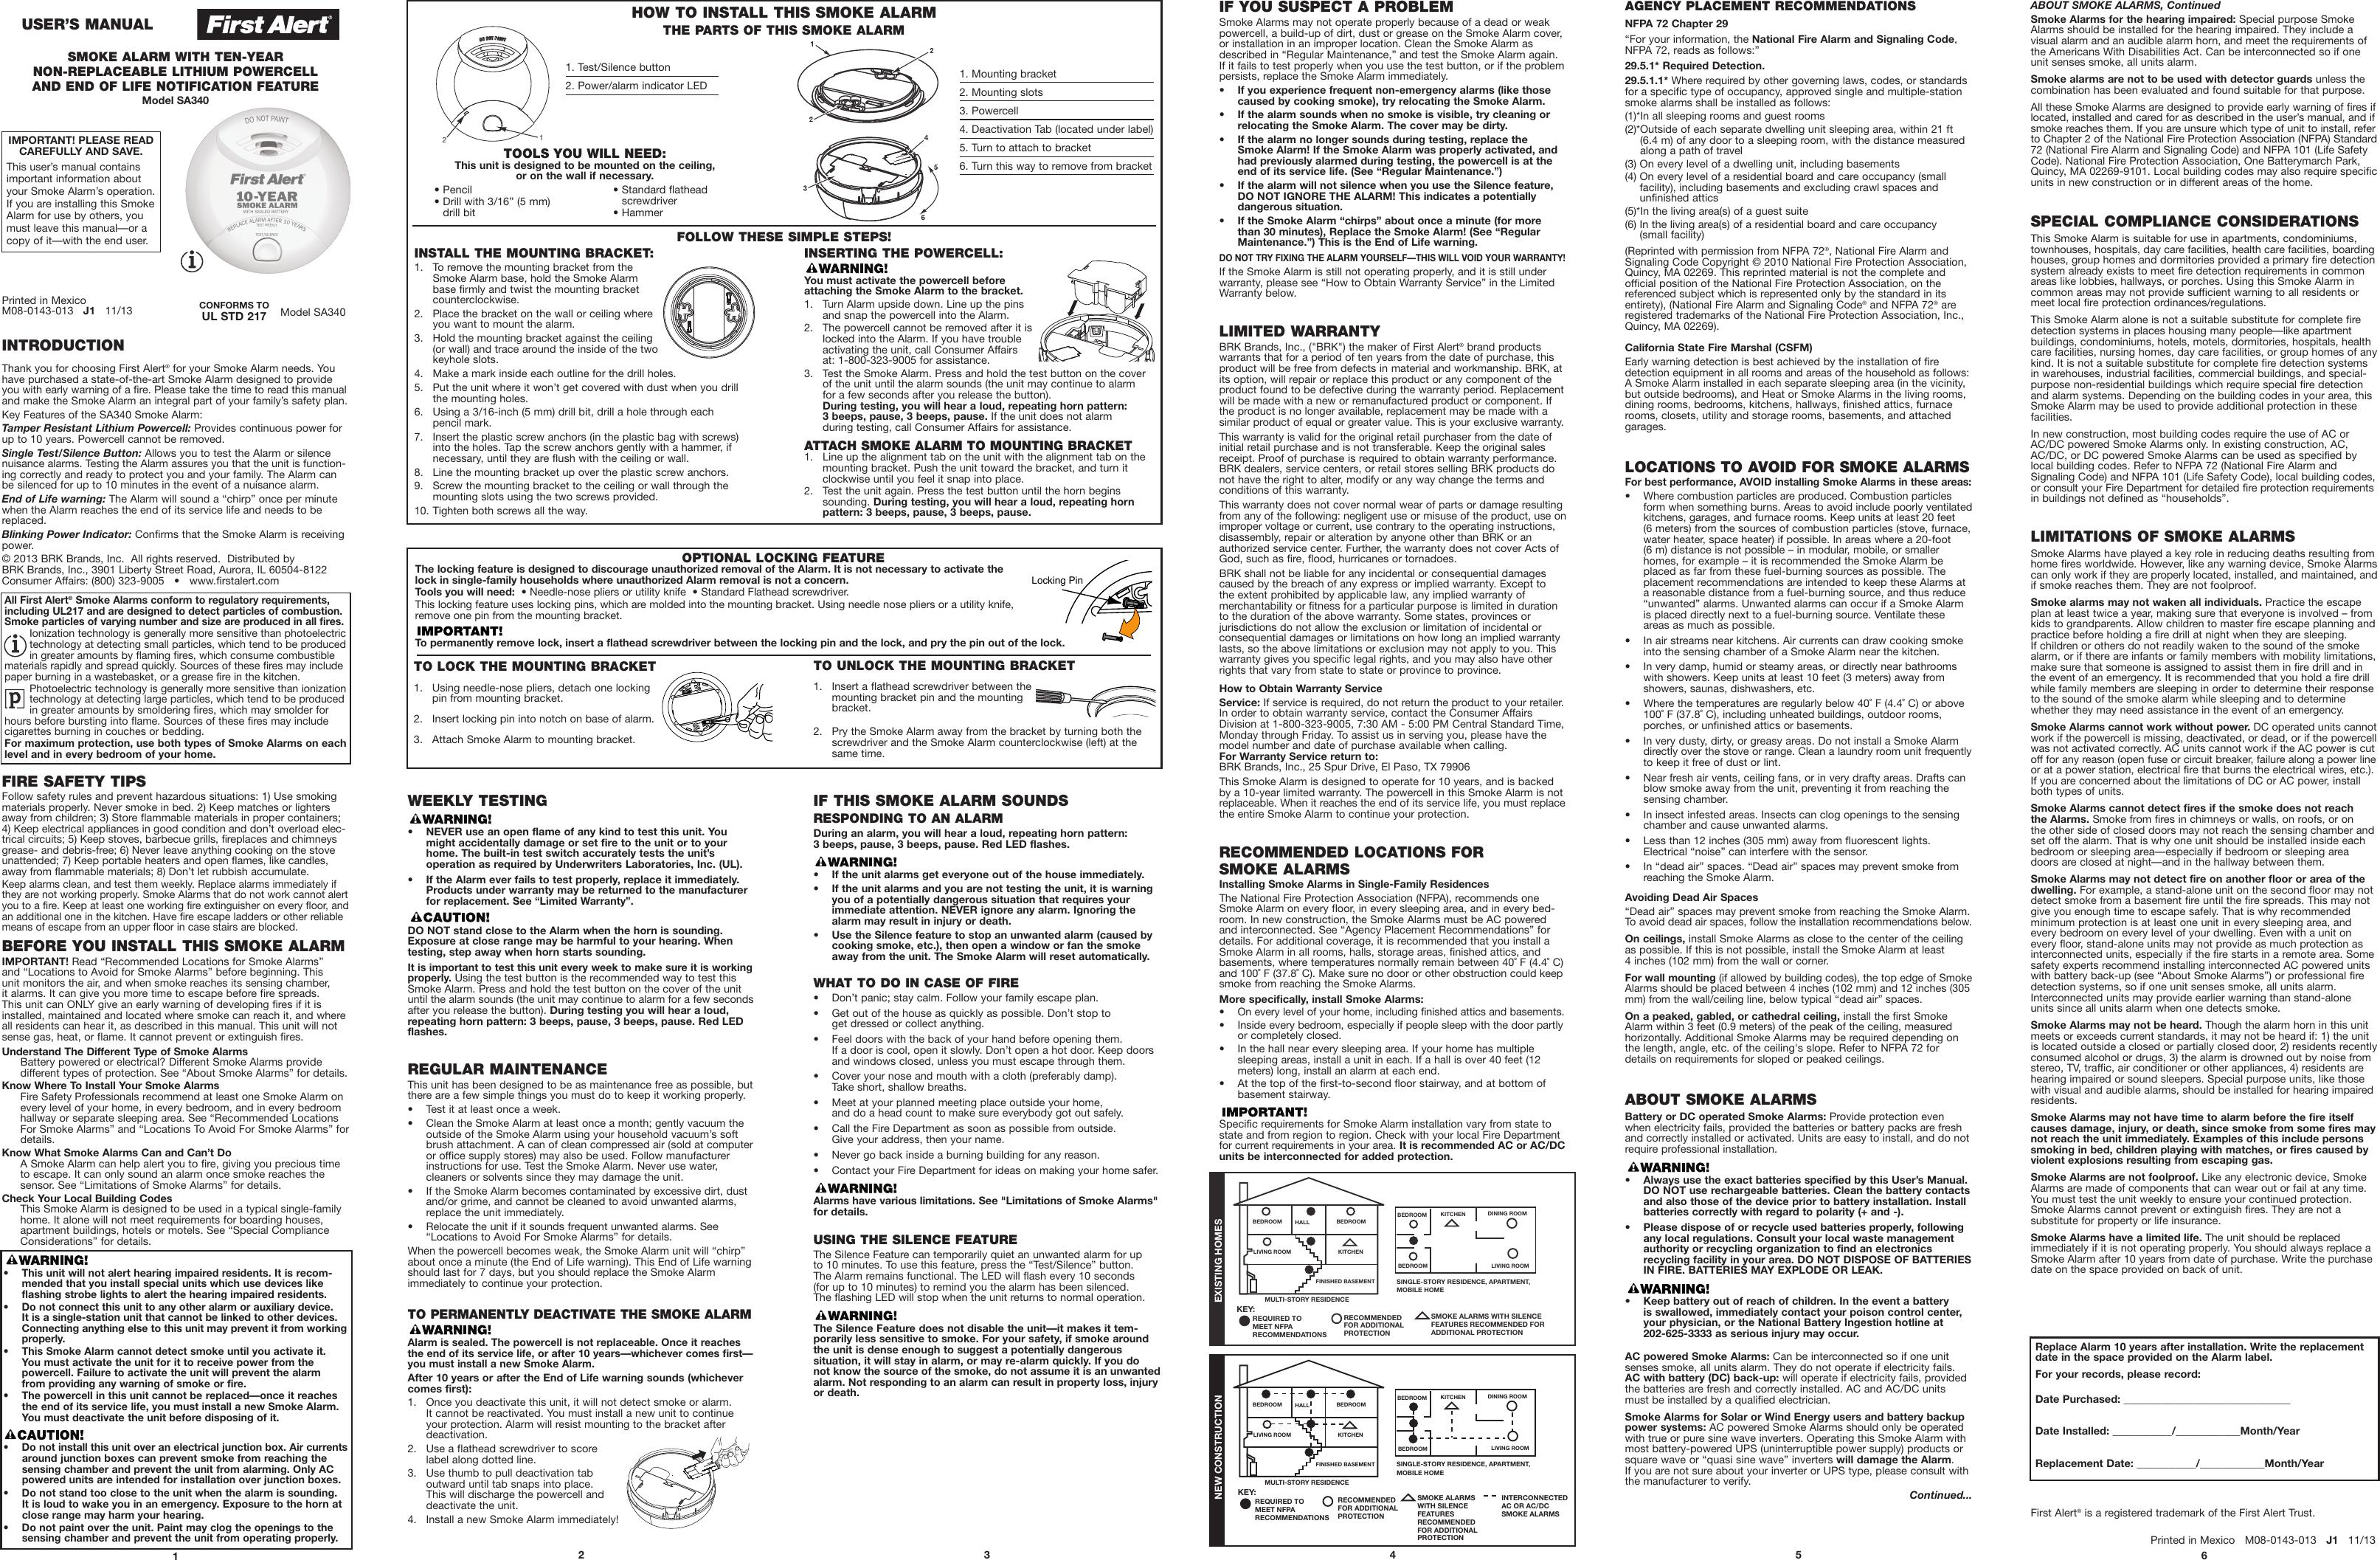 First Alert Tamperproof Smoke Alarm With 10 Year Lithium Battery Detector Wiring Diagram Users Manual Sa340